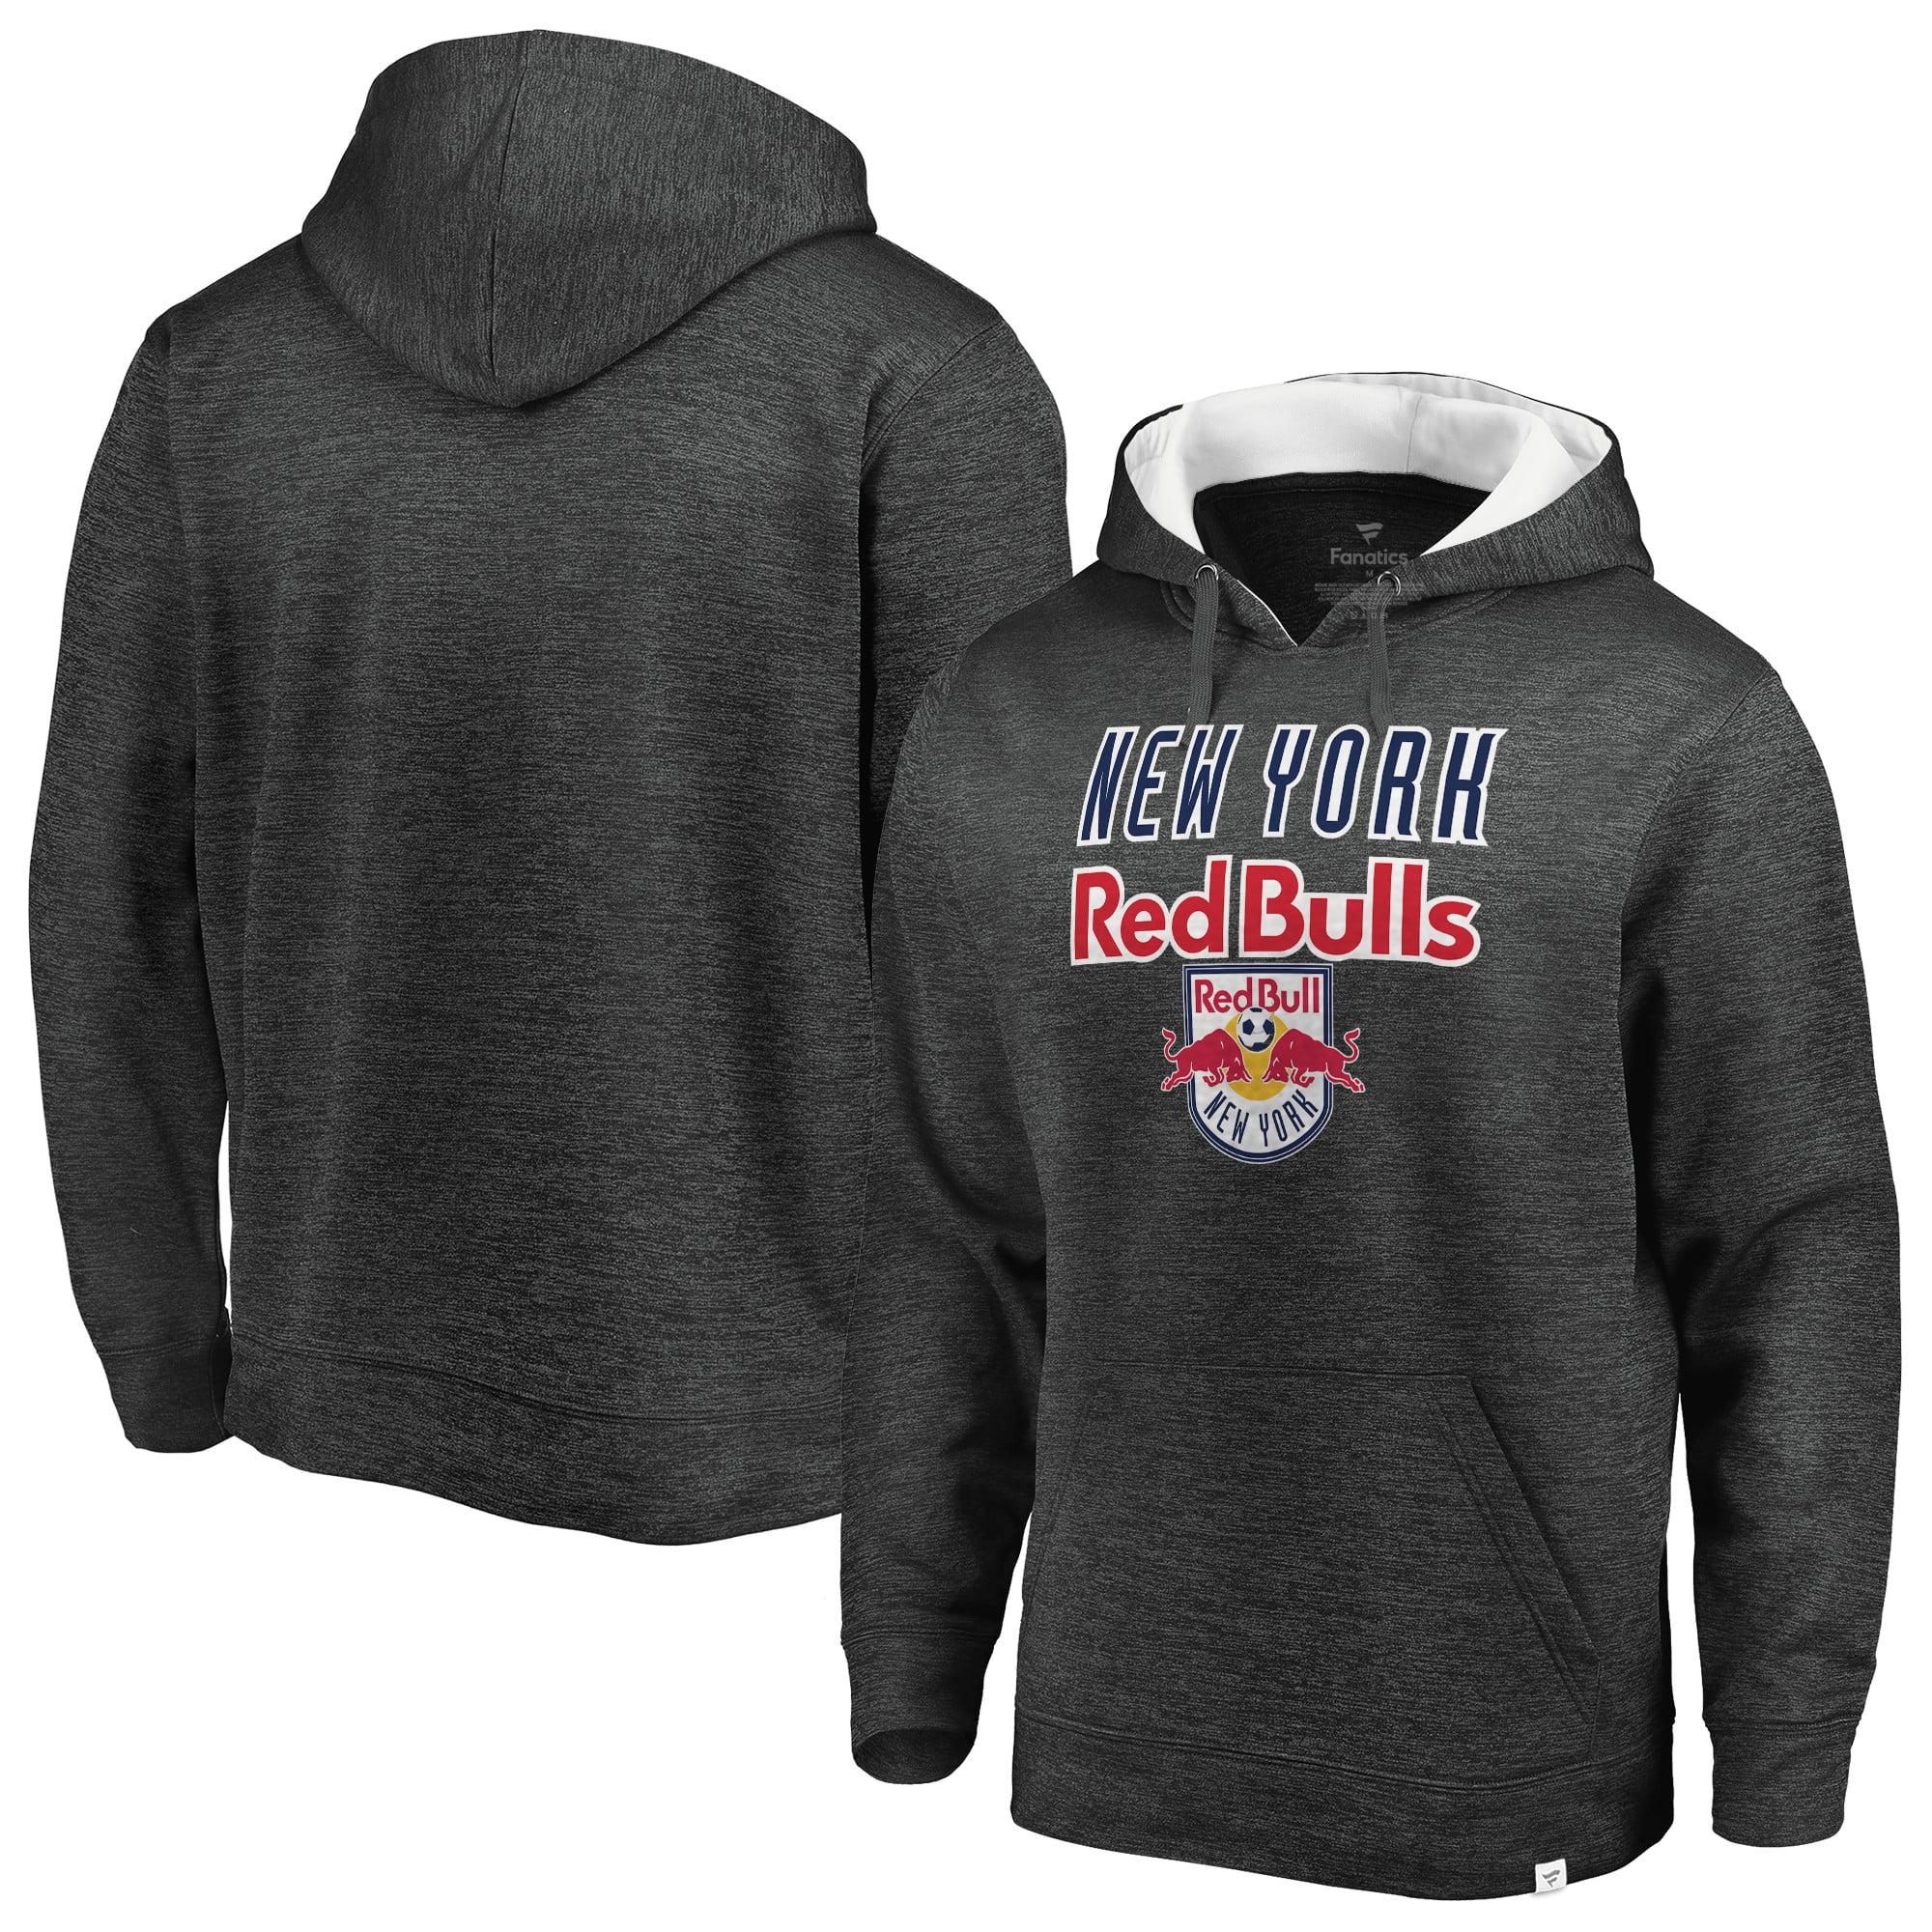 New York Red Bulls Fanatics Branded Pullover Hoodie - Heathered Gray